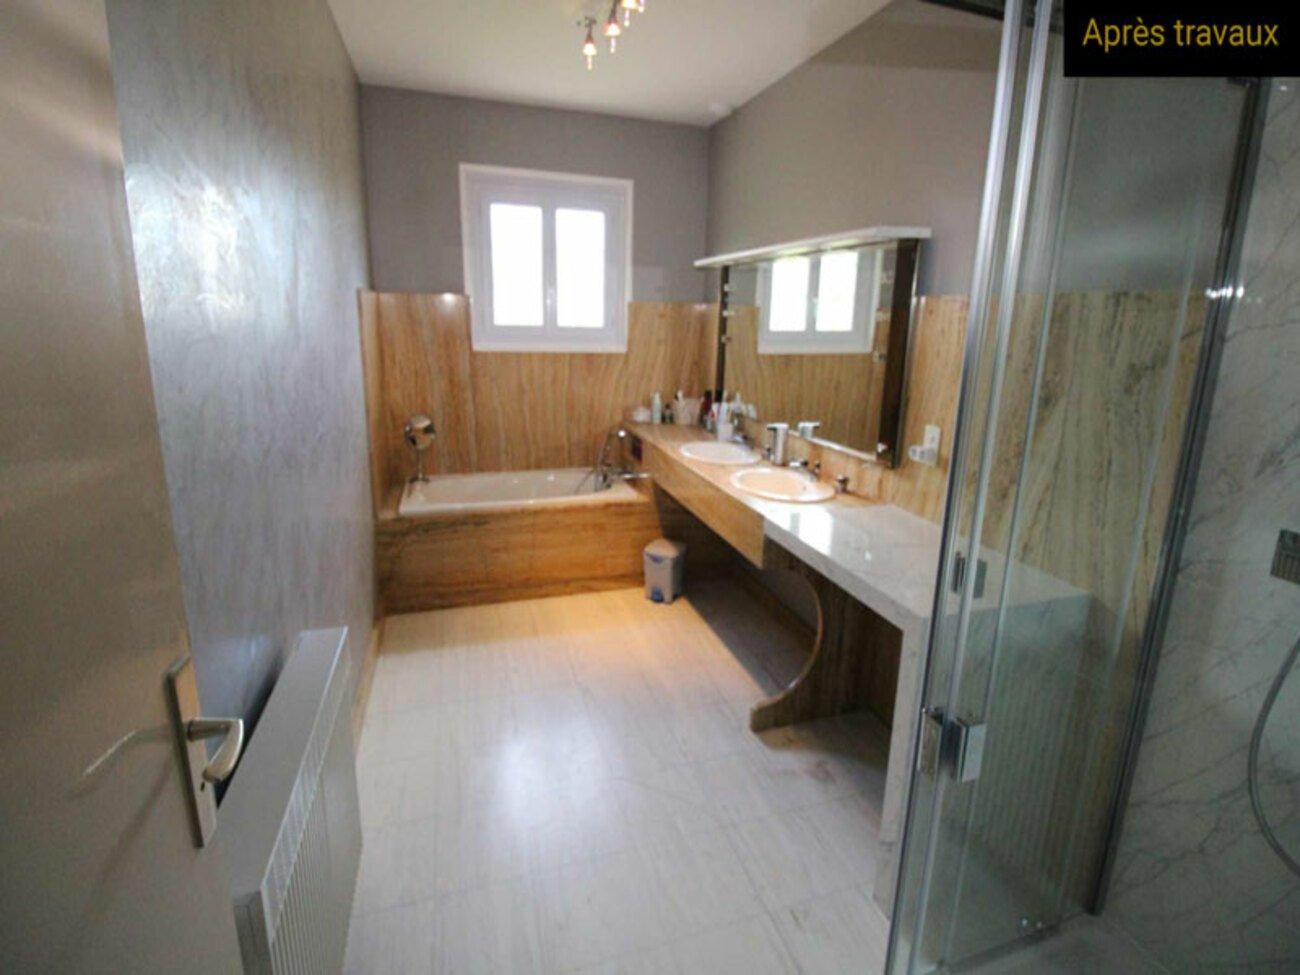 travaux-salle-de-bain-lyon-5